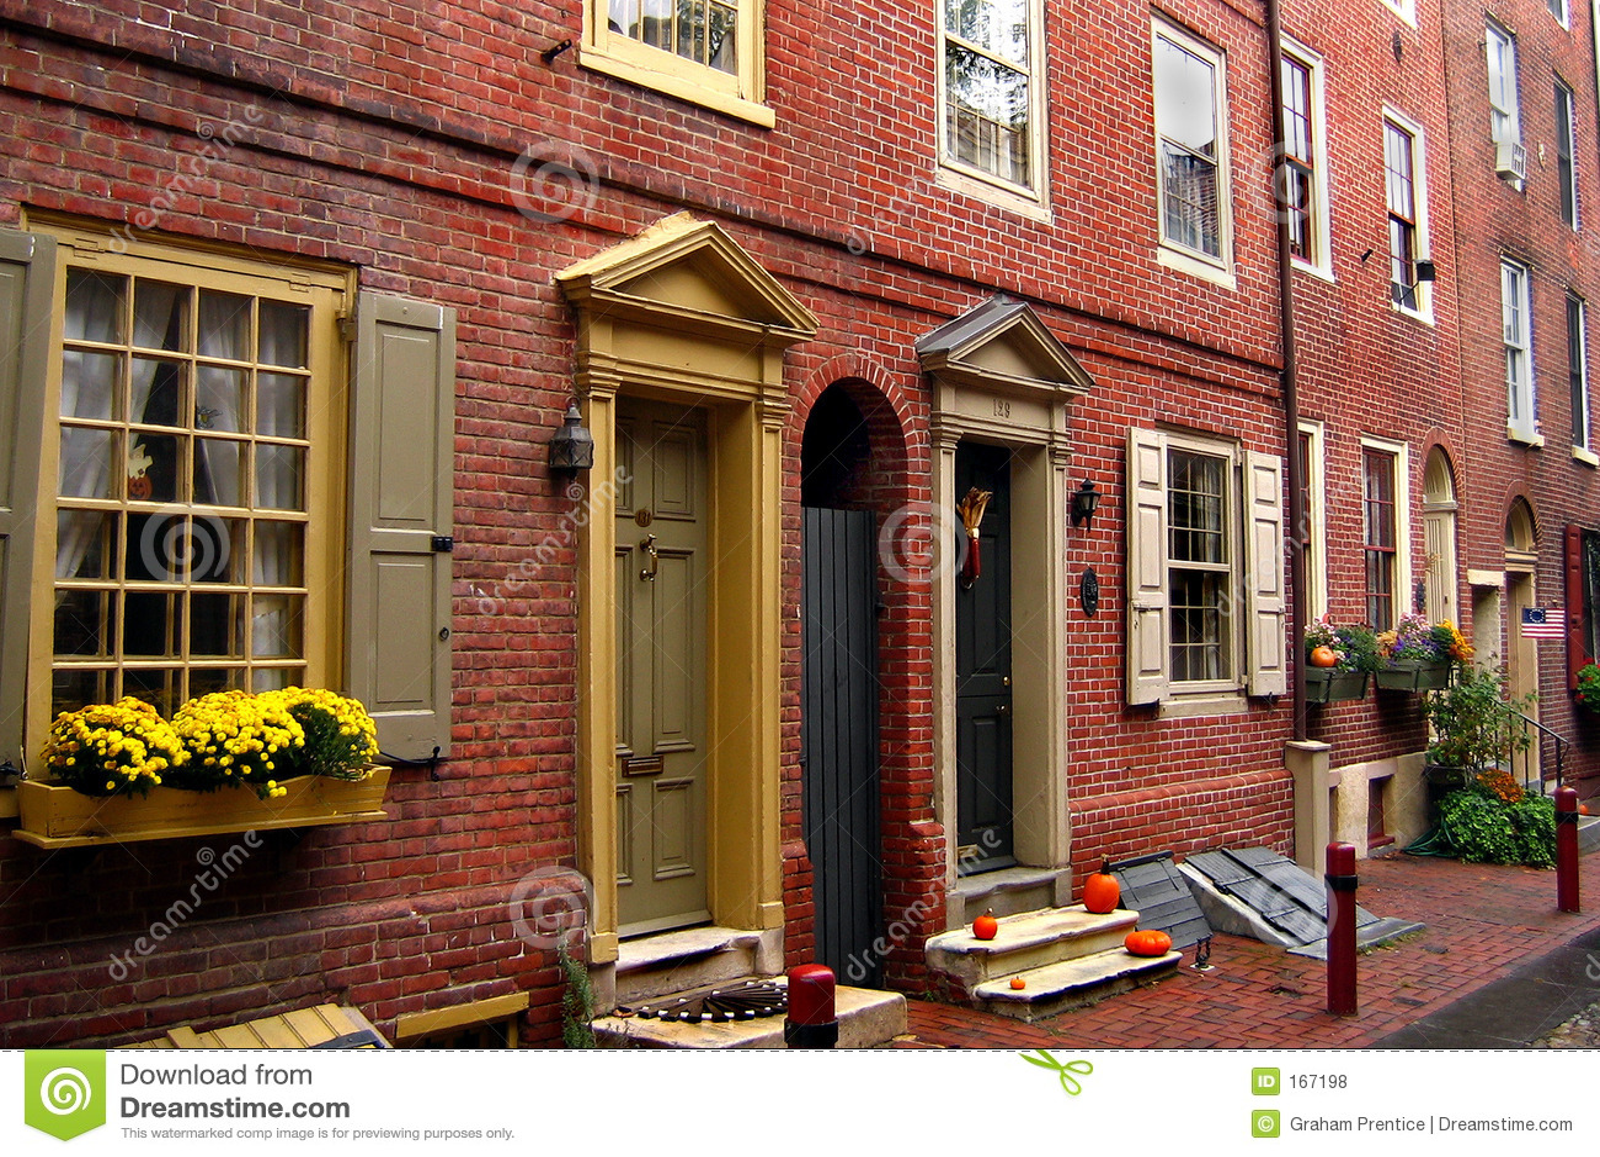 Brick street front